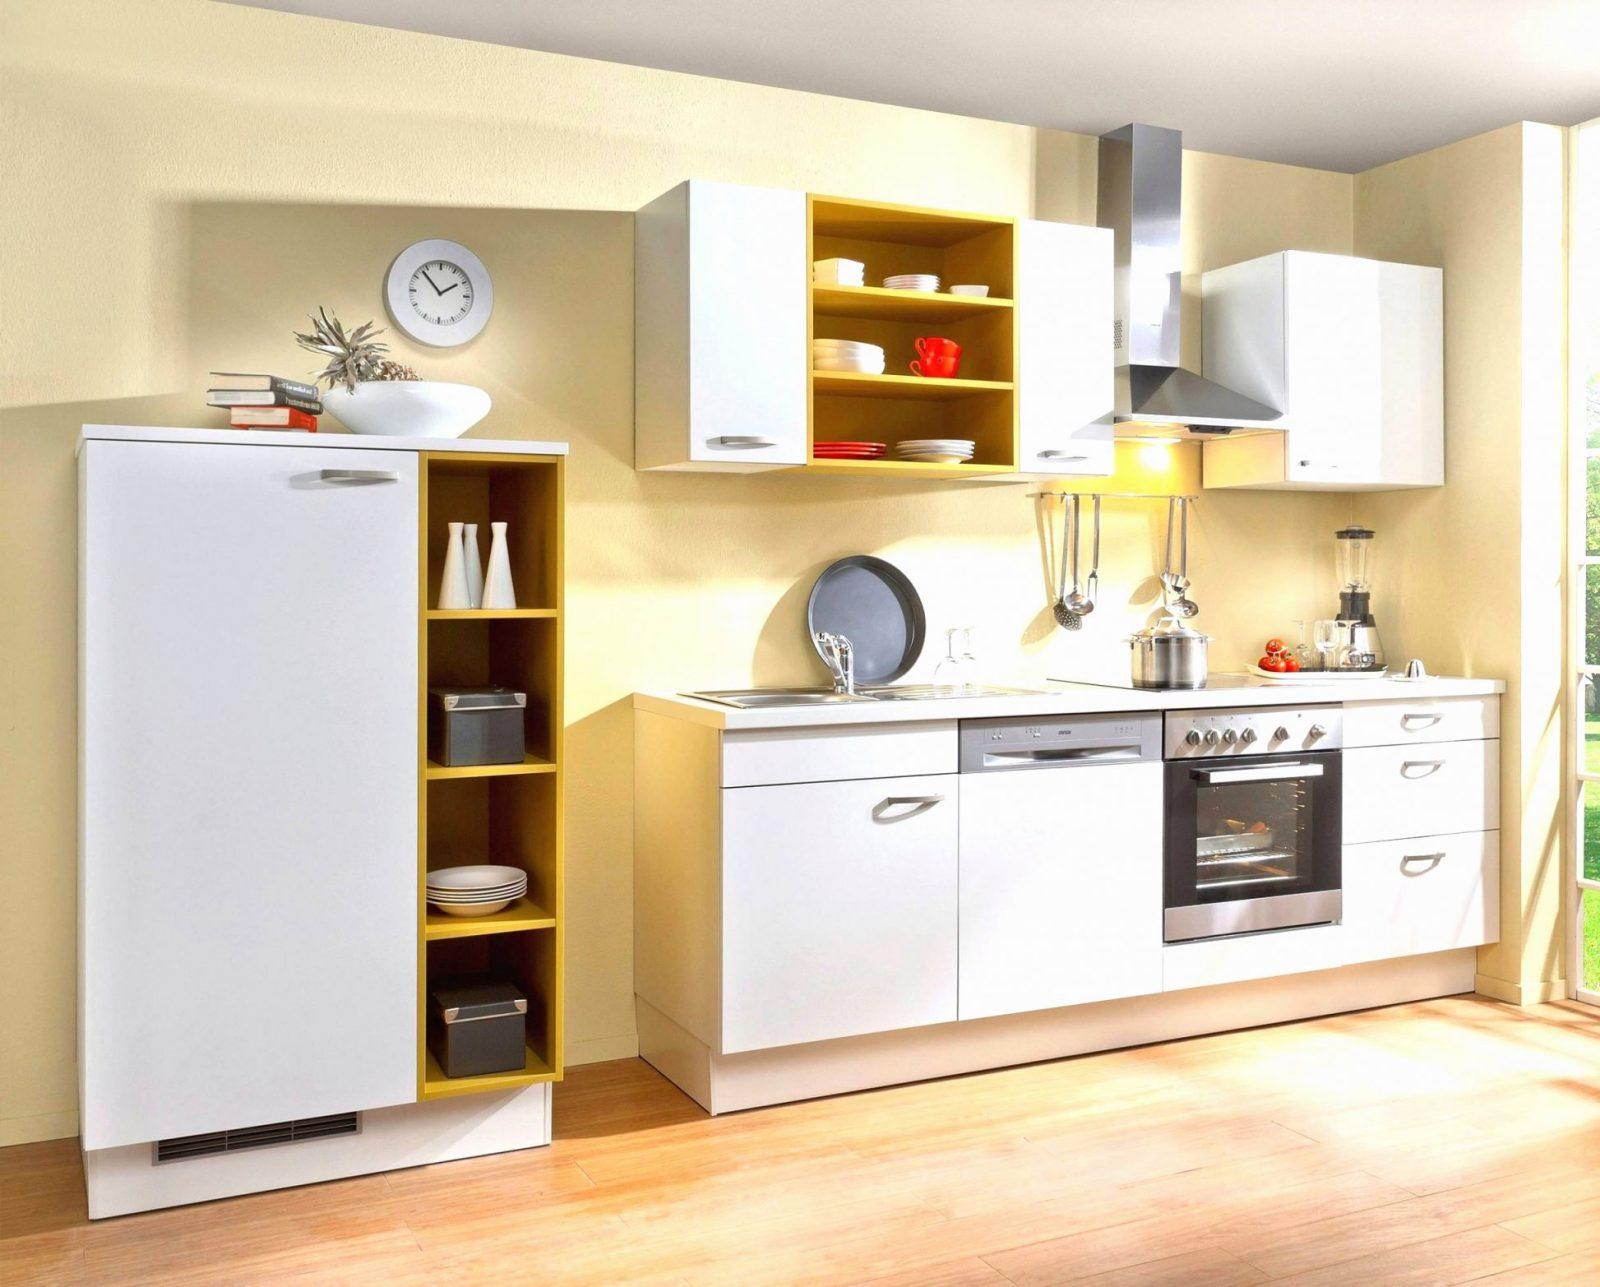 Kuchenbank Selber Bauen Frisch Sitzbank Selber Bauen Minimalist von Sitzbank Küche Selber Bauen Photo